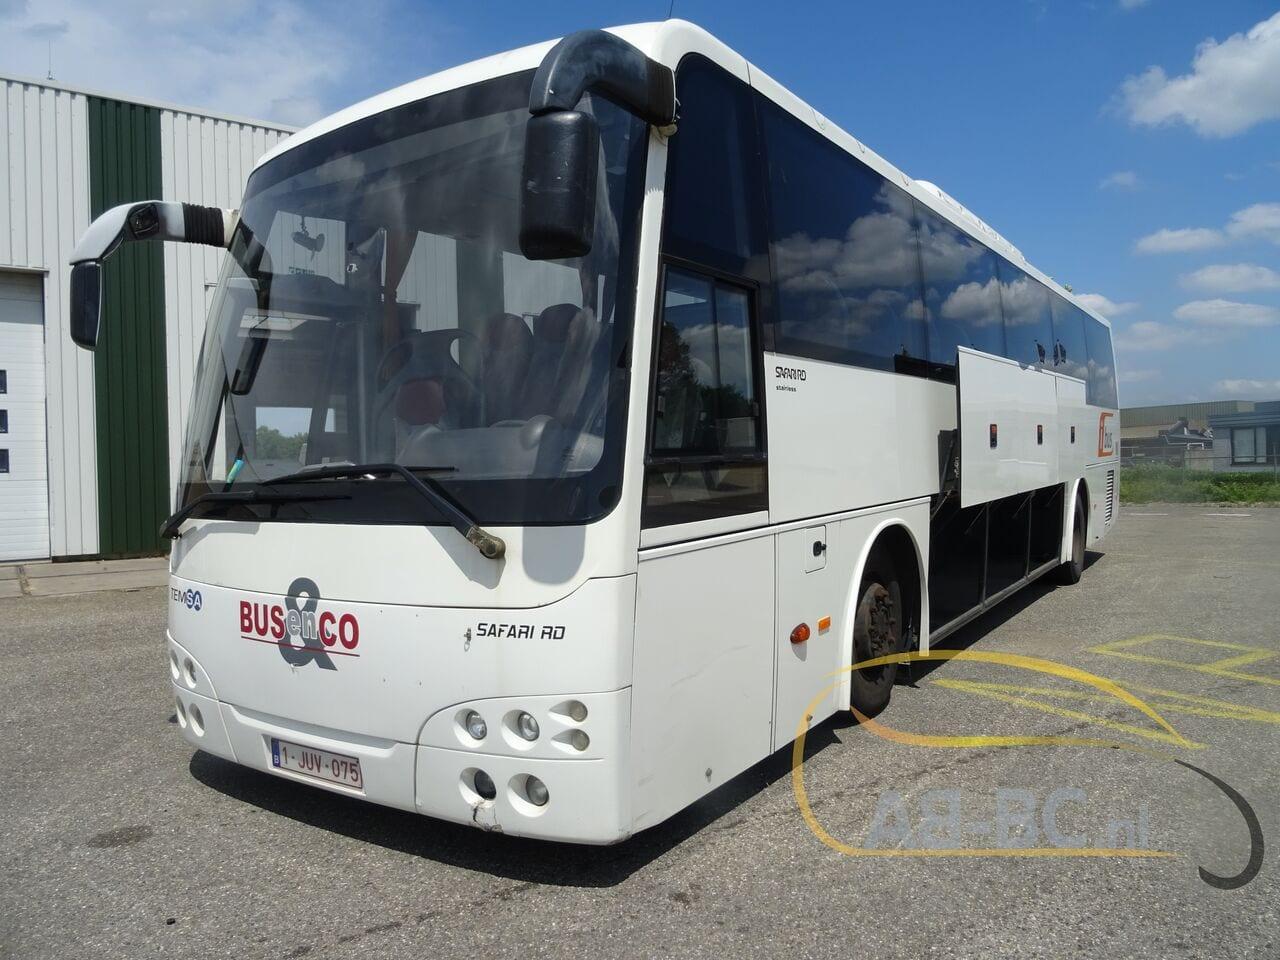 coach-busTEMSA-Safari-RD-DAF-Motor-53-Seats-Euro-5---1623932737803846265_big_5af683ab88dc31719d3c2f45c577ff57--21061715155620919600